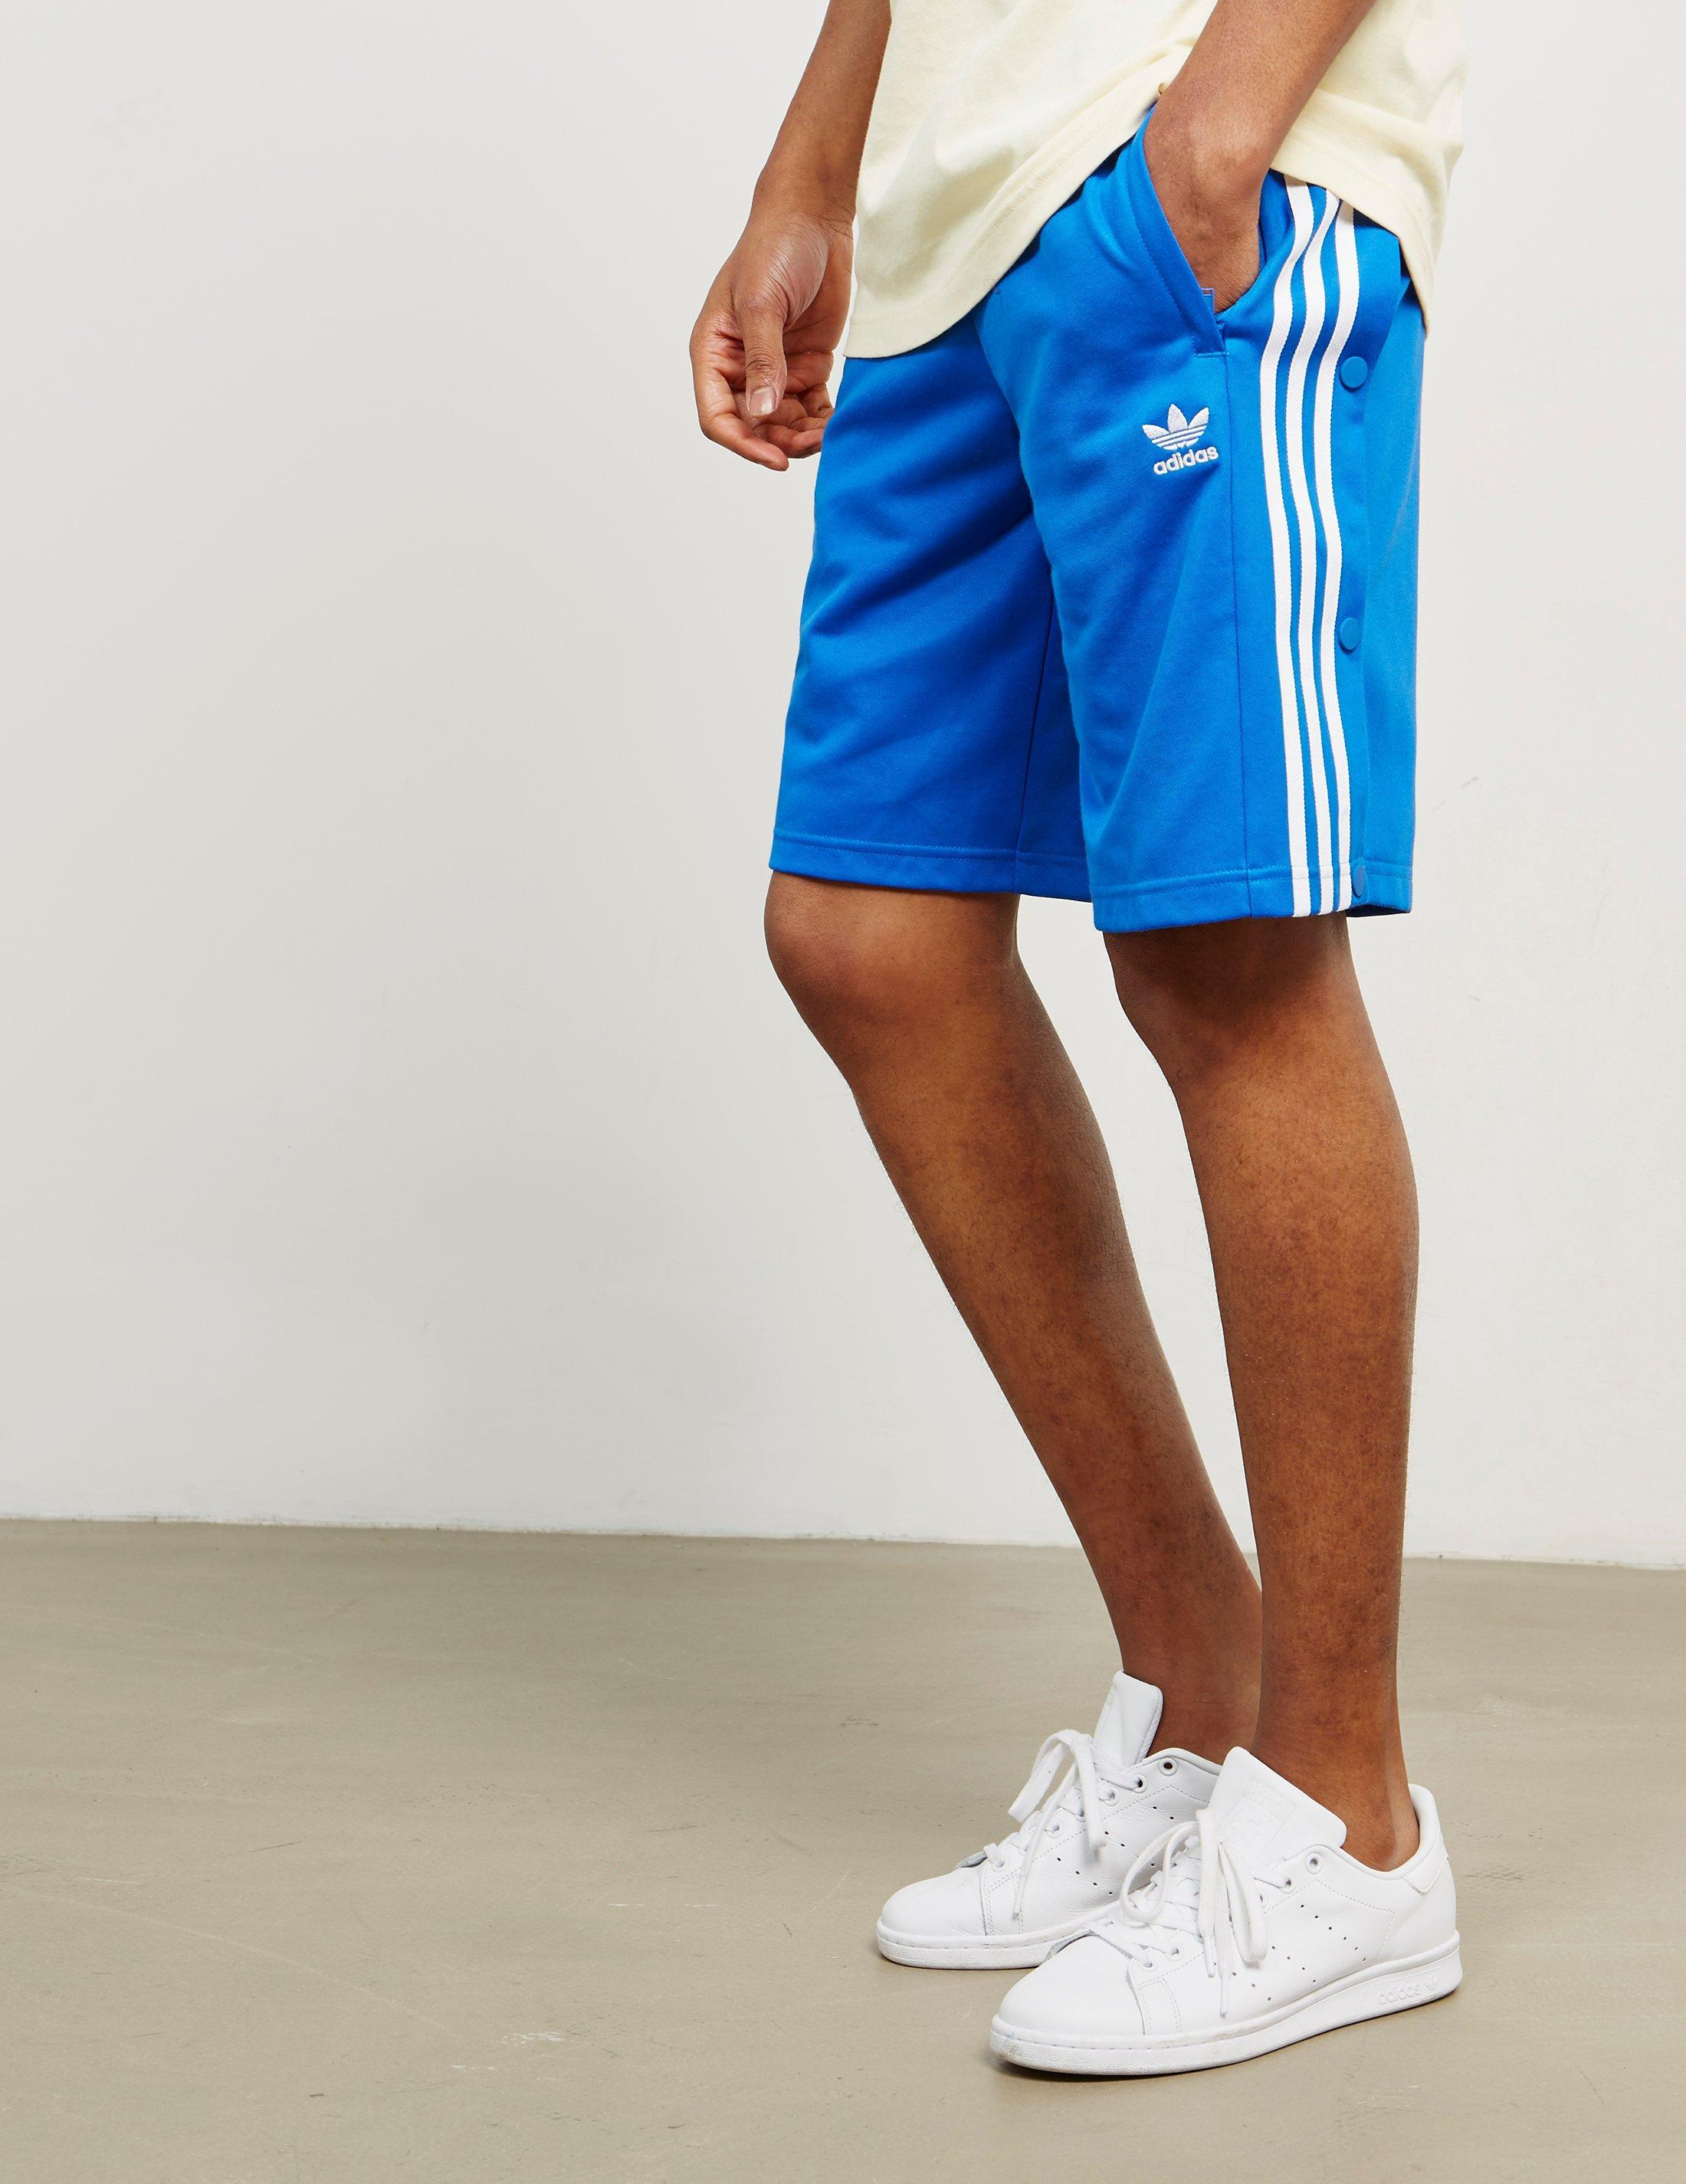 Lyst Adidas a Originals Pantalones cortos a presión para hombre azul Lyst azul/ azul en azul b387c1a - hotlink.pw